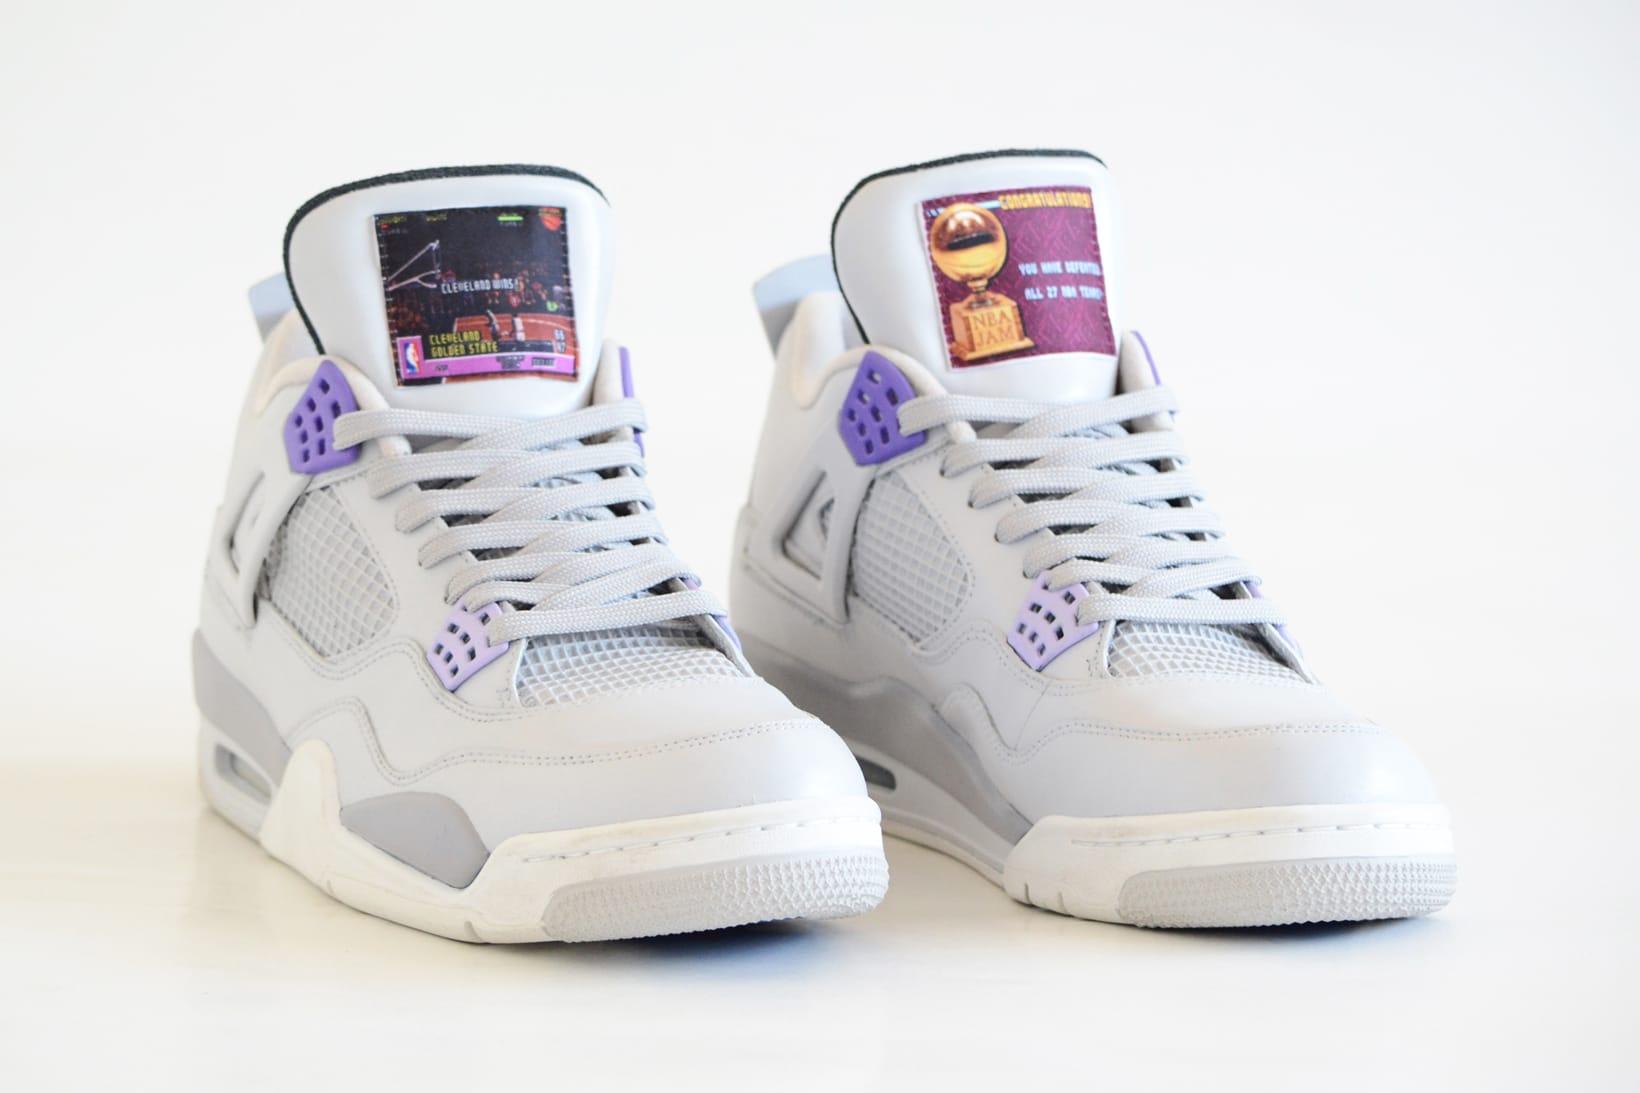 Air Jordan 4 SNES US Custom Sneakers